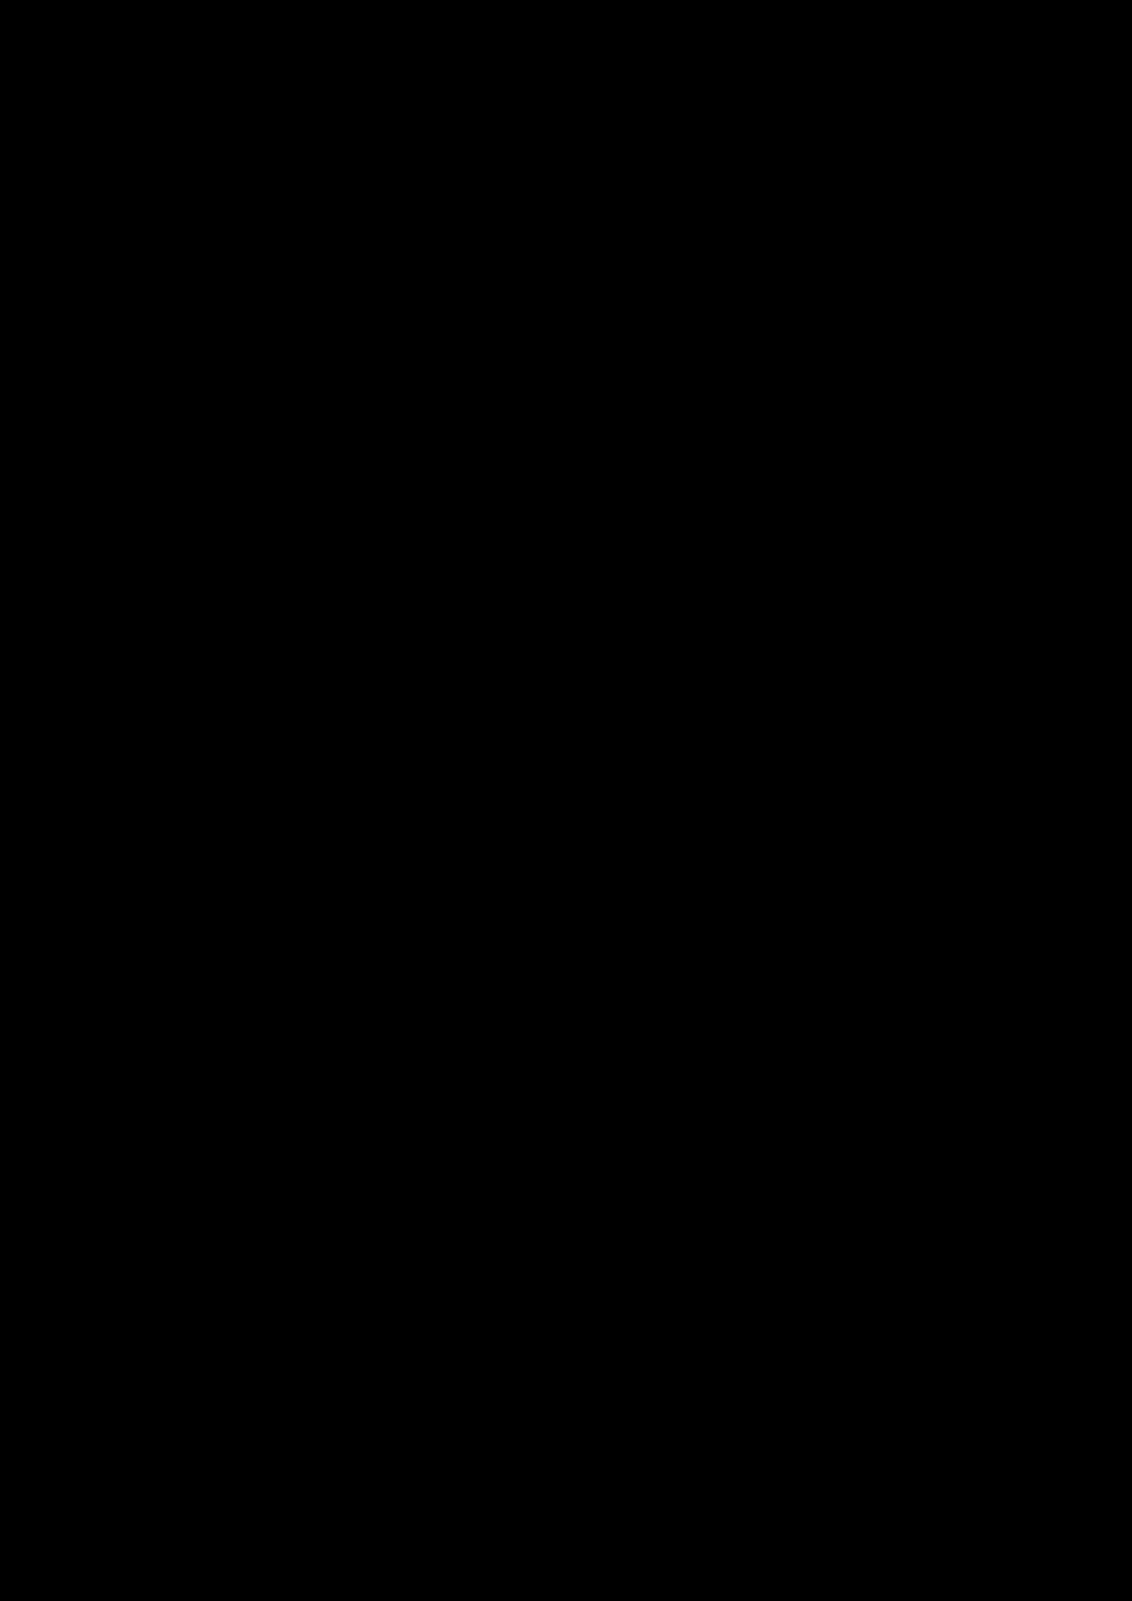 Ispoved Pervogo Boga slide, Image 62